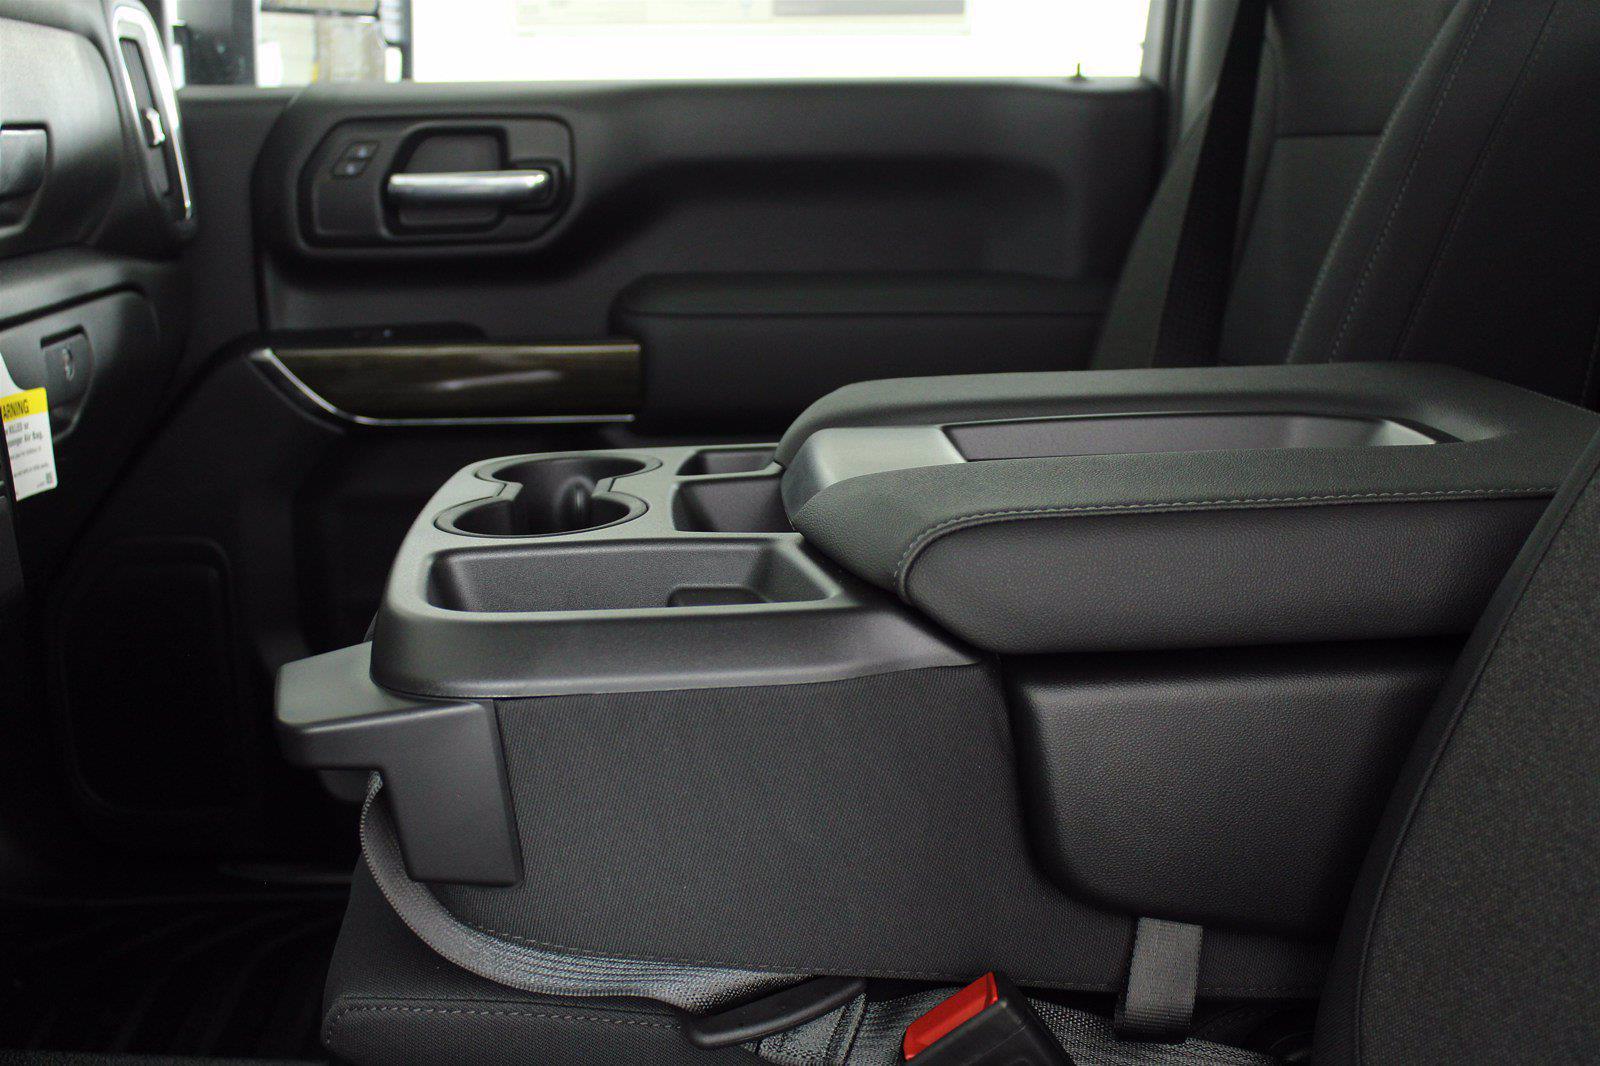 2022 Silverado 2500 Regular Cab 4x4,  Pickup #D120020 - photo 13